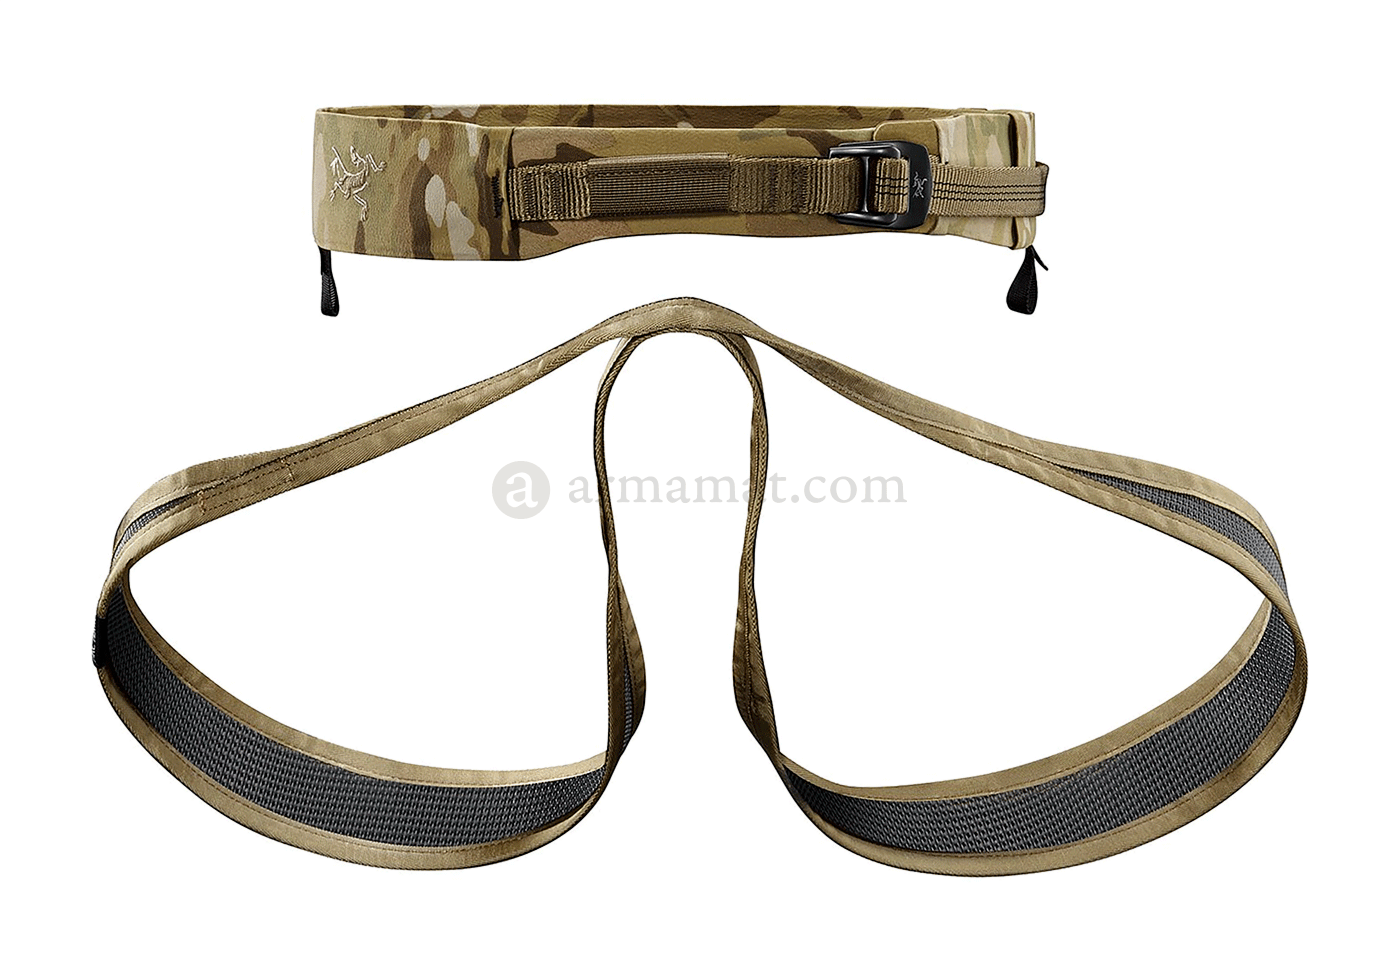 Arcteryx Klettergurt Xl : E rigger s harness multicam arc teryx xl safety